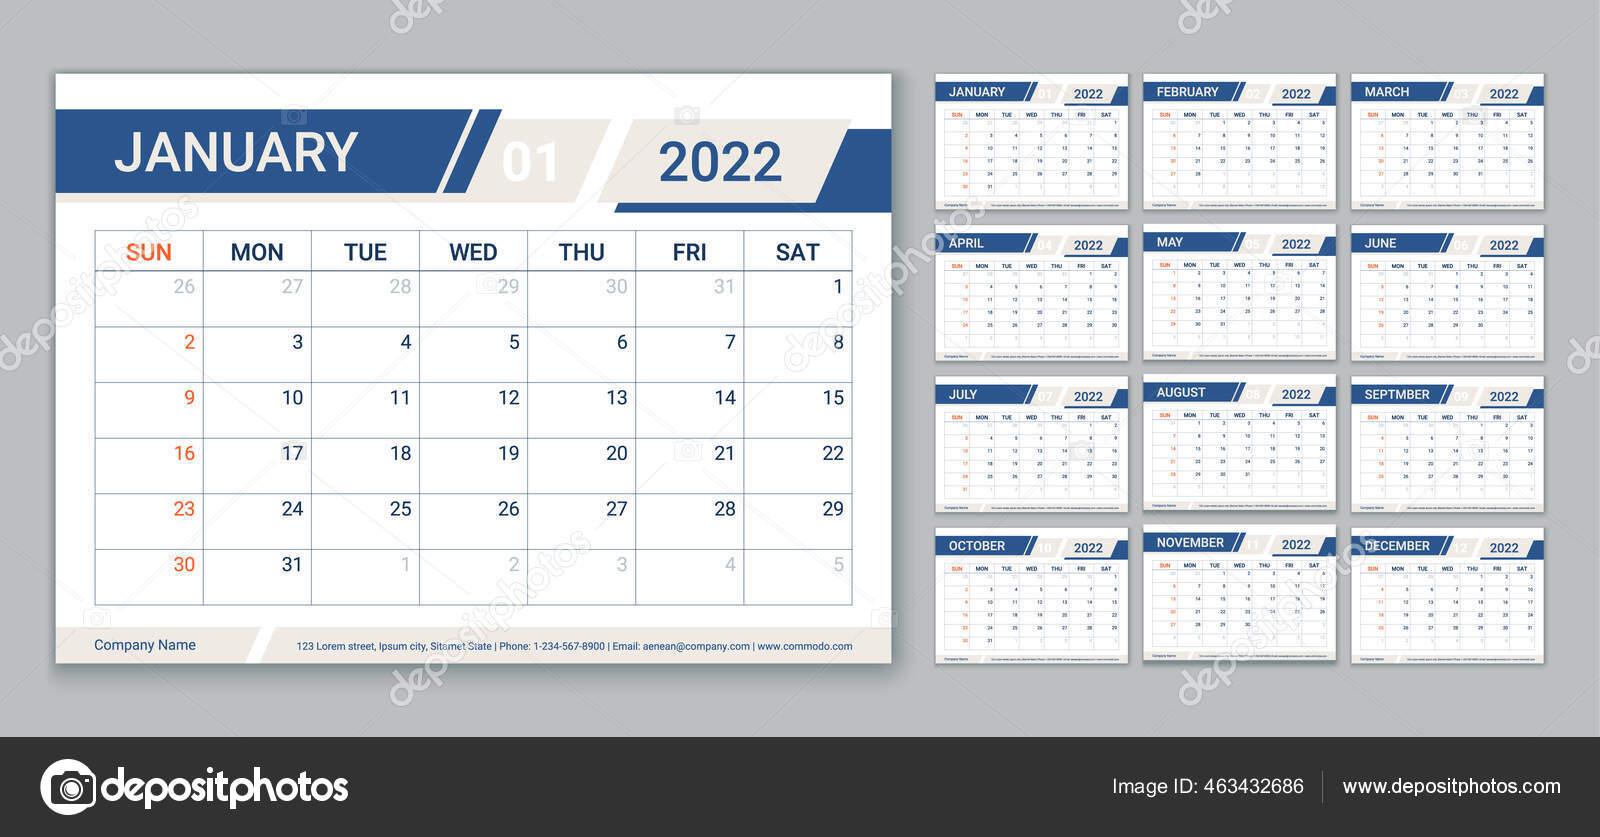 Planner Calendar 2022 Year Calender Template Week Starts Sunday Vector Vector Image By C Maradaisy Vector Stock 463432686